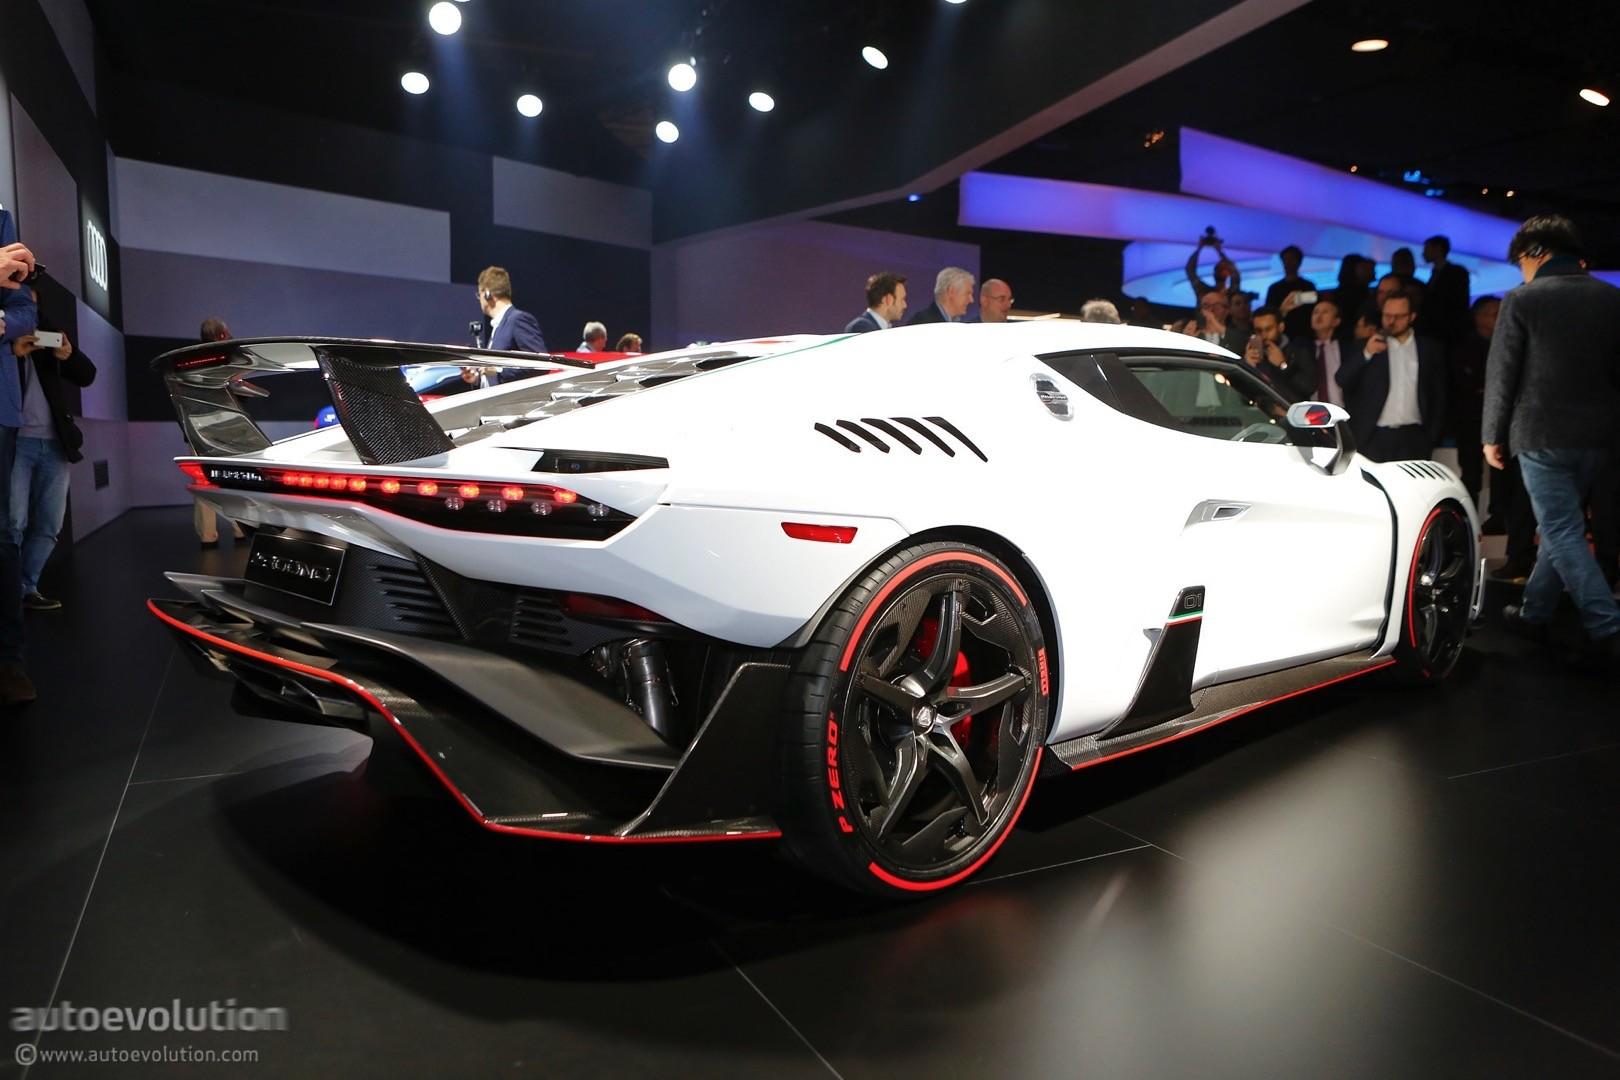 Italdesign Zerouno Roadster En Route To 2018 Geneva Motor